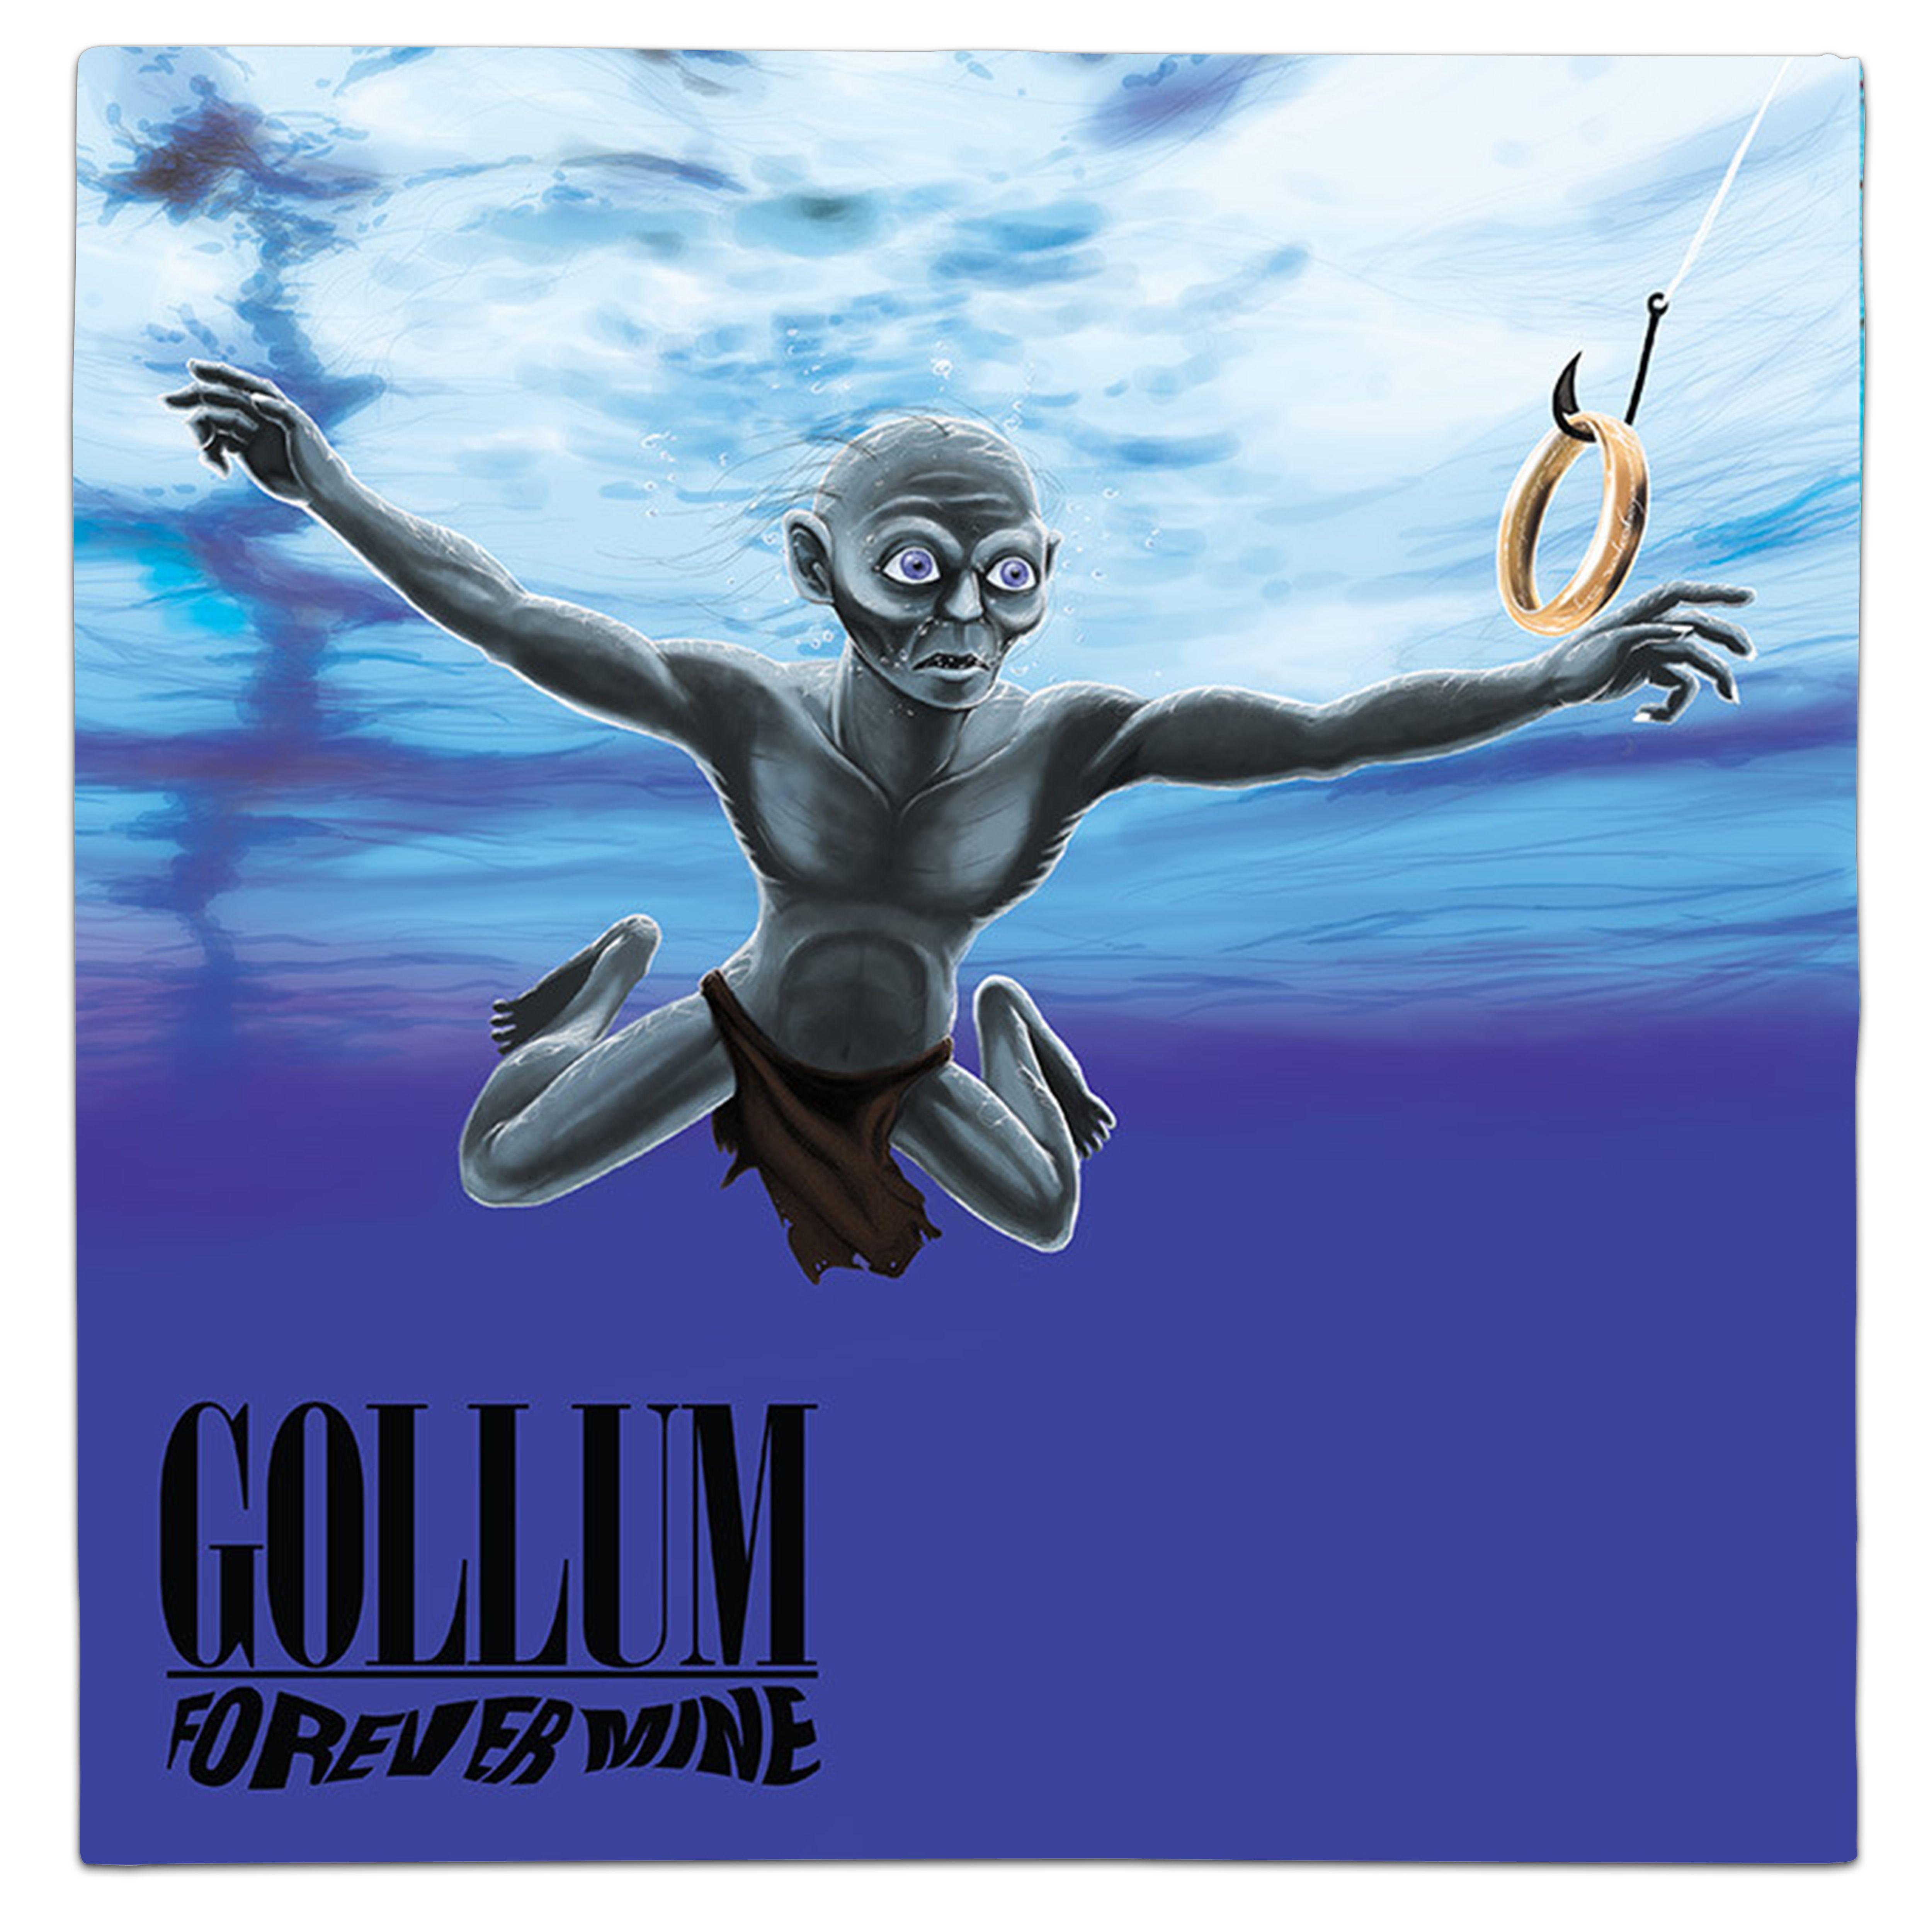 Lord Of Rings Gollum Nirvana Nevermind Vinyl Mash Up Album Parody Source Unknowalbum